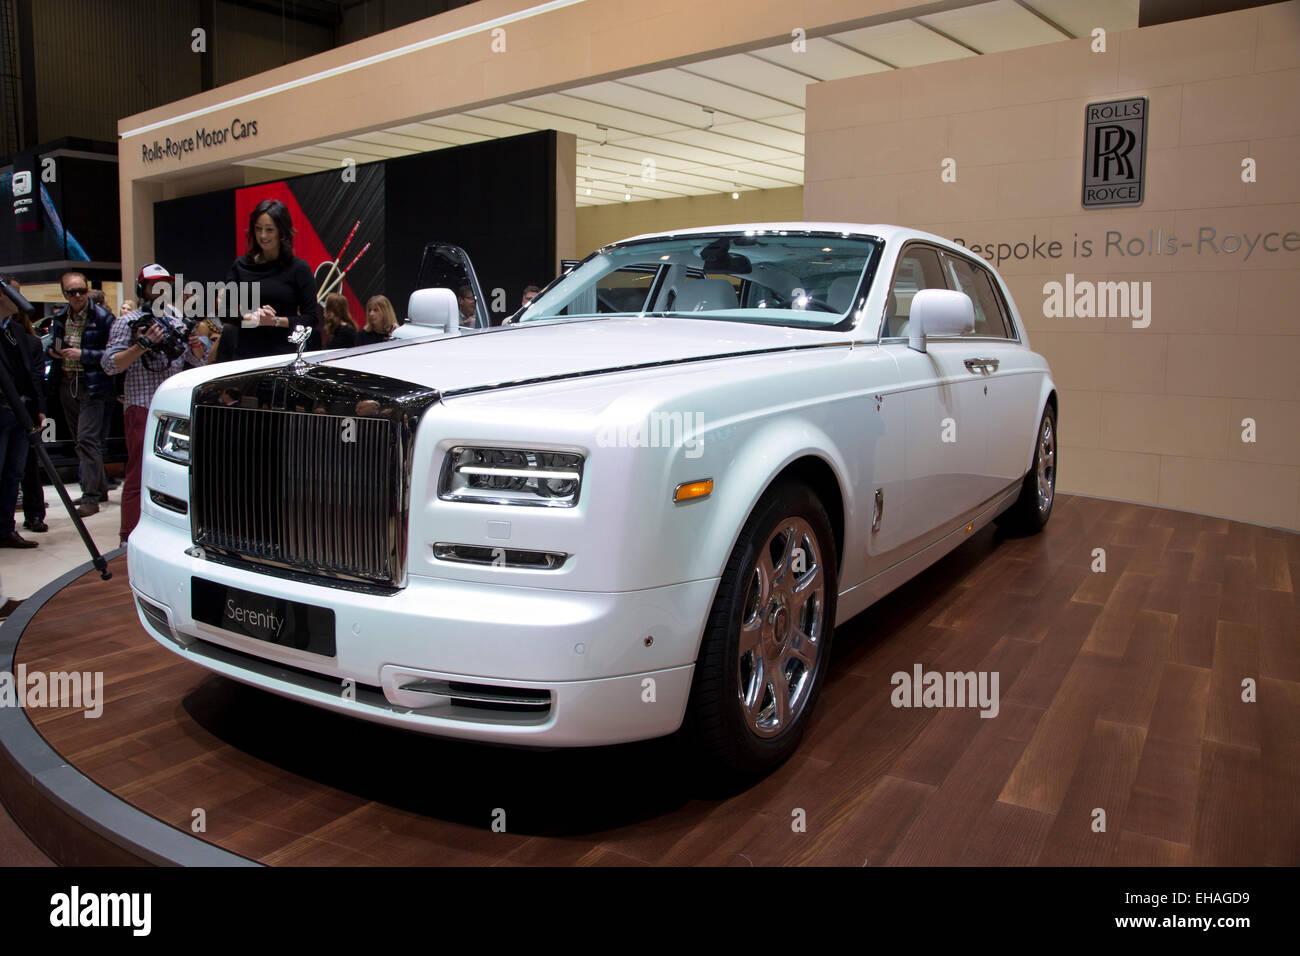 Rolls Royce Phantom Gelassenheit auf der Genfer Motor show 2015 Stockbild